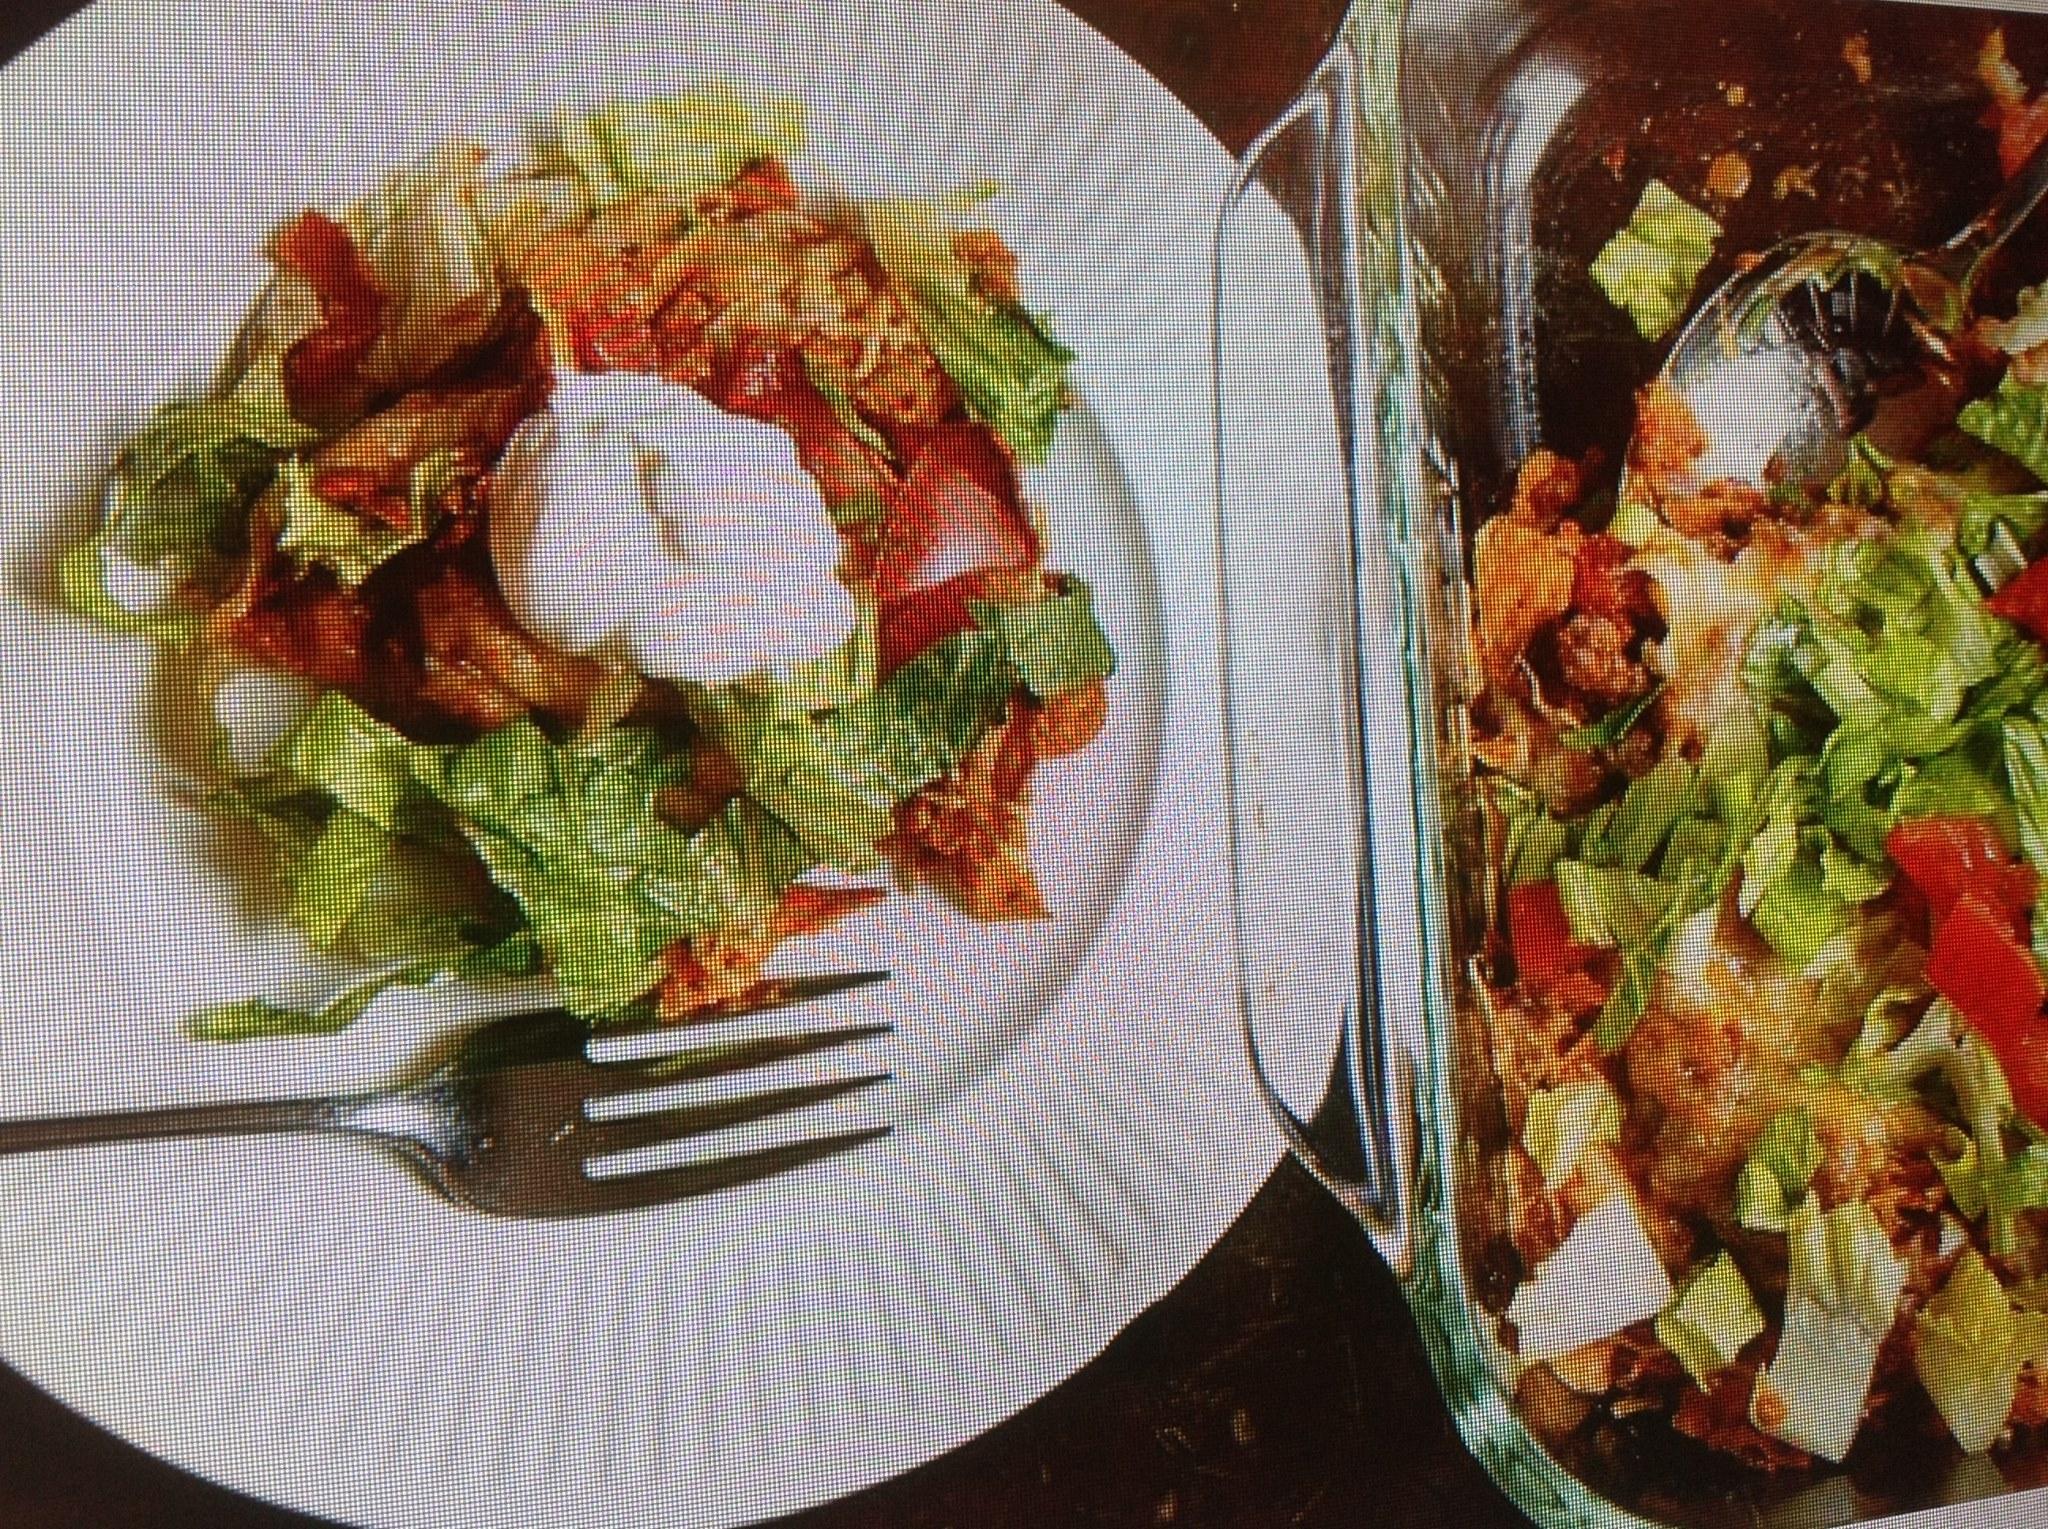 Crunchy-Crispy Taco Casserole